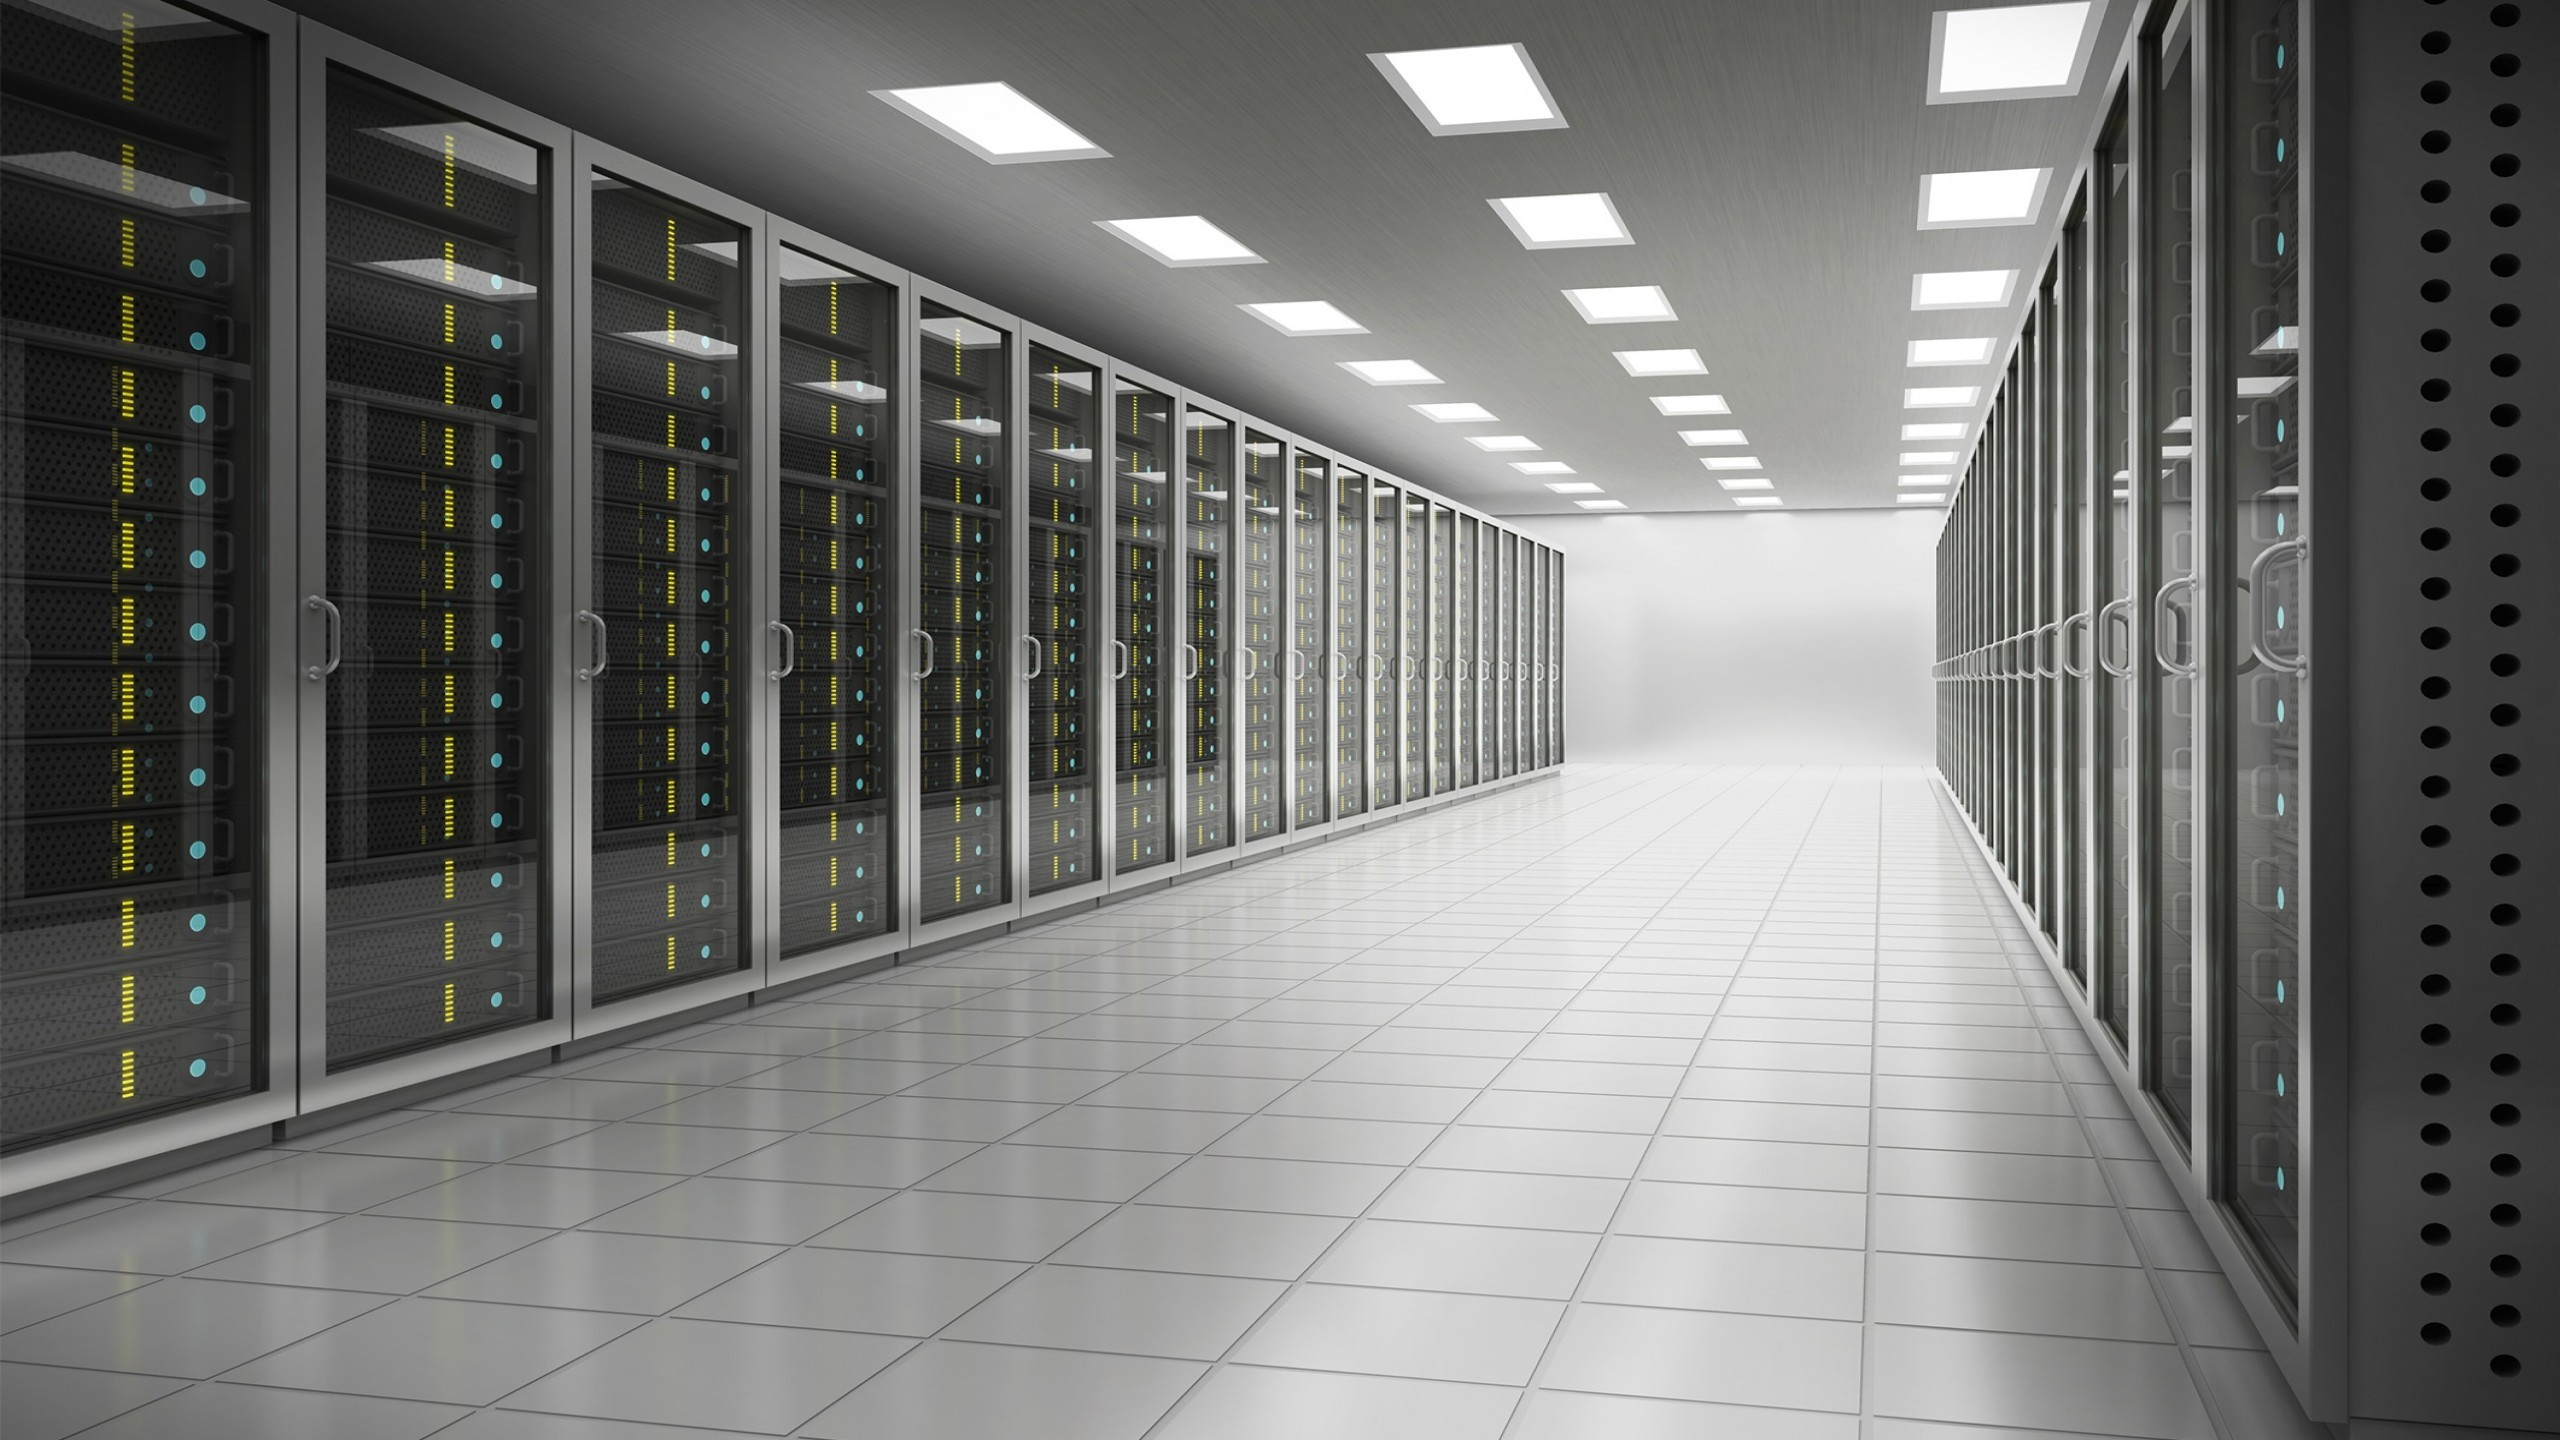 General 2560x1440 server lights glass tiles technology Hi-Tech room architecture door data center gray